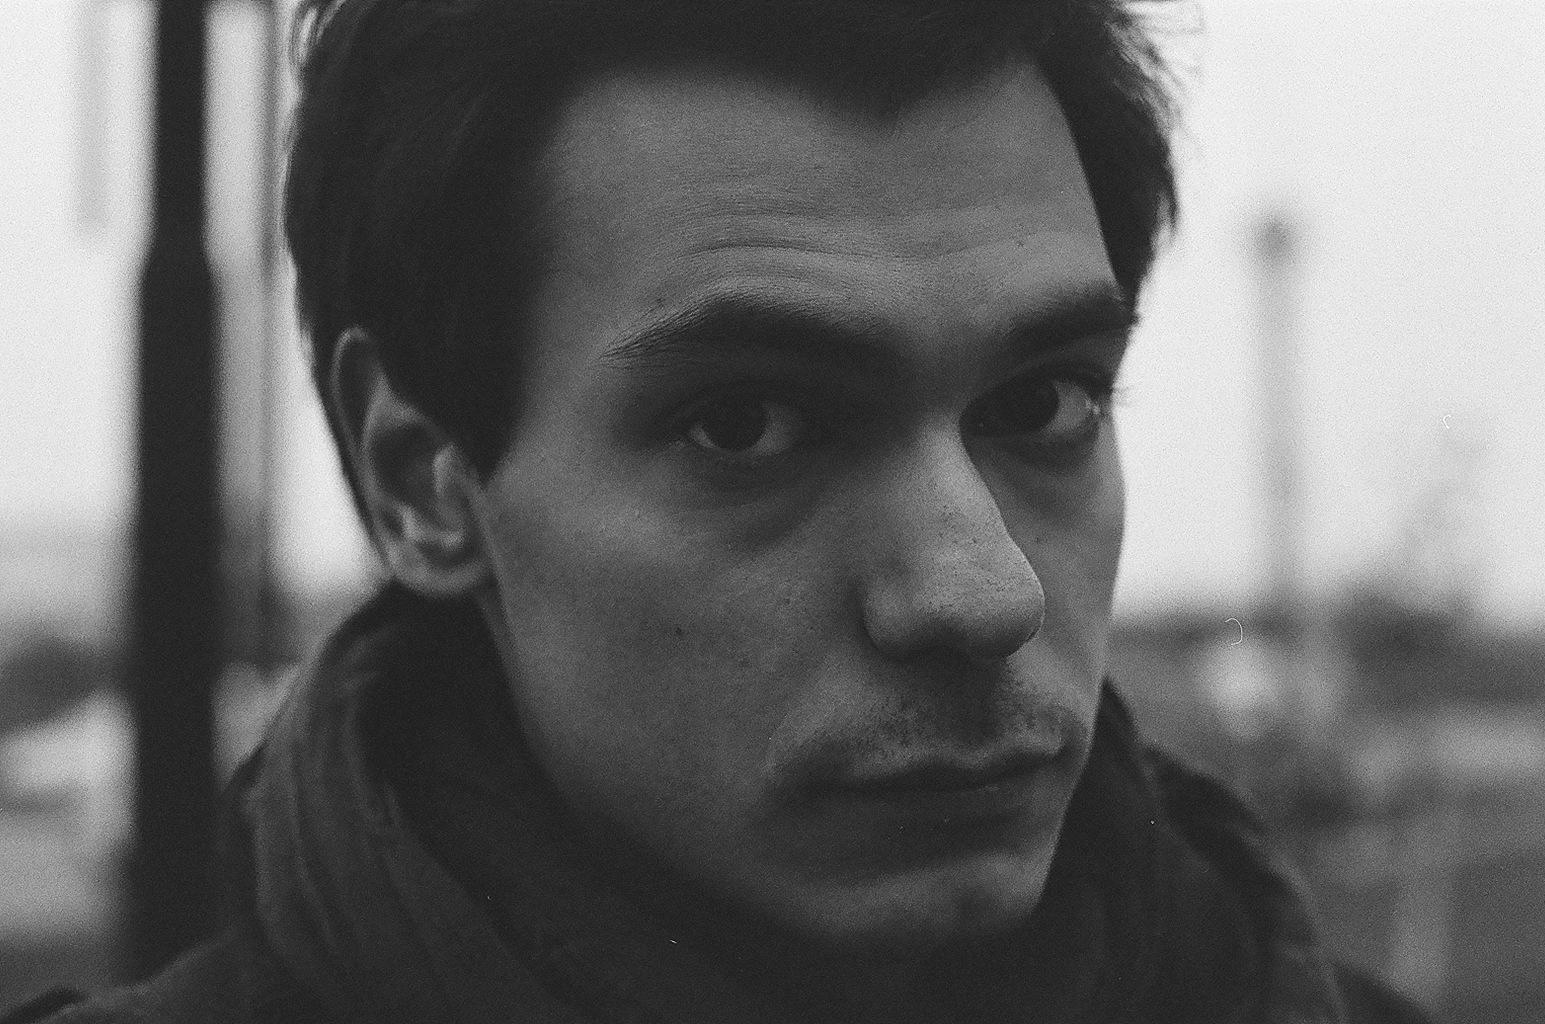 Григориј Коломицев